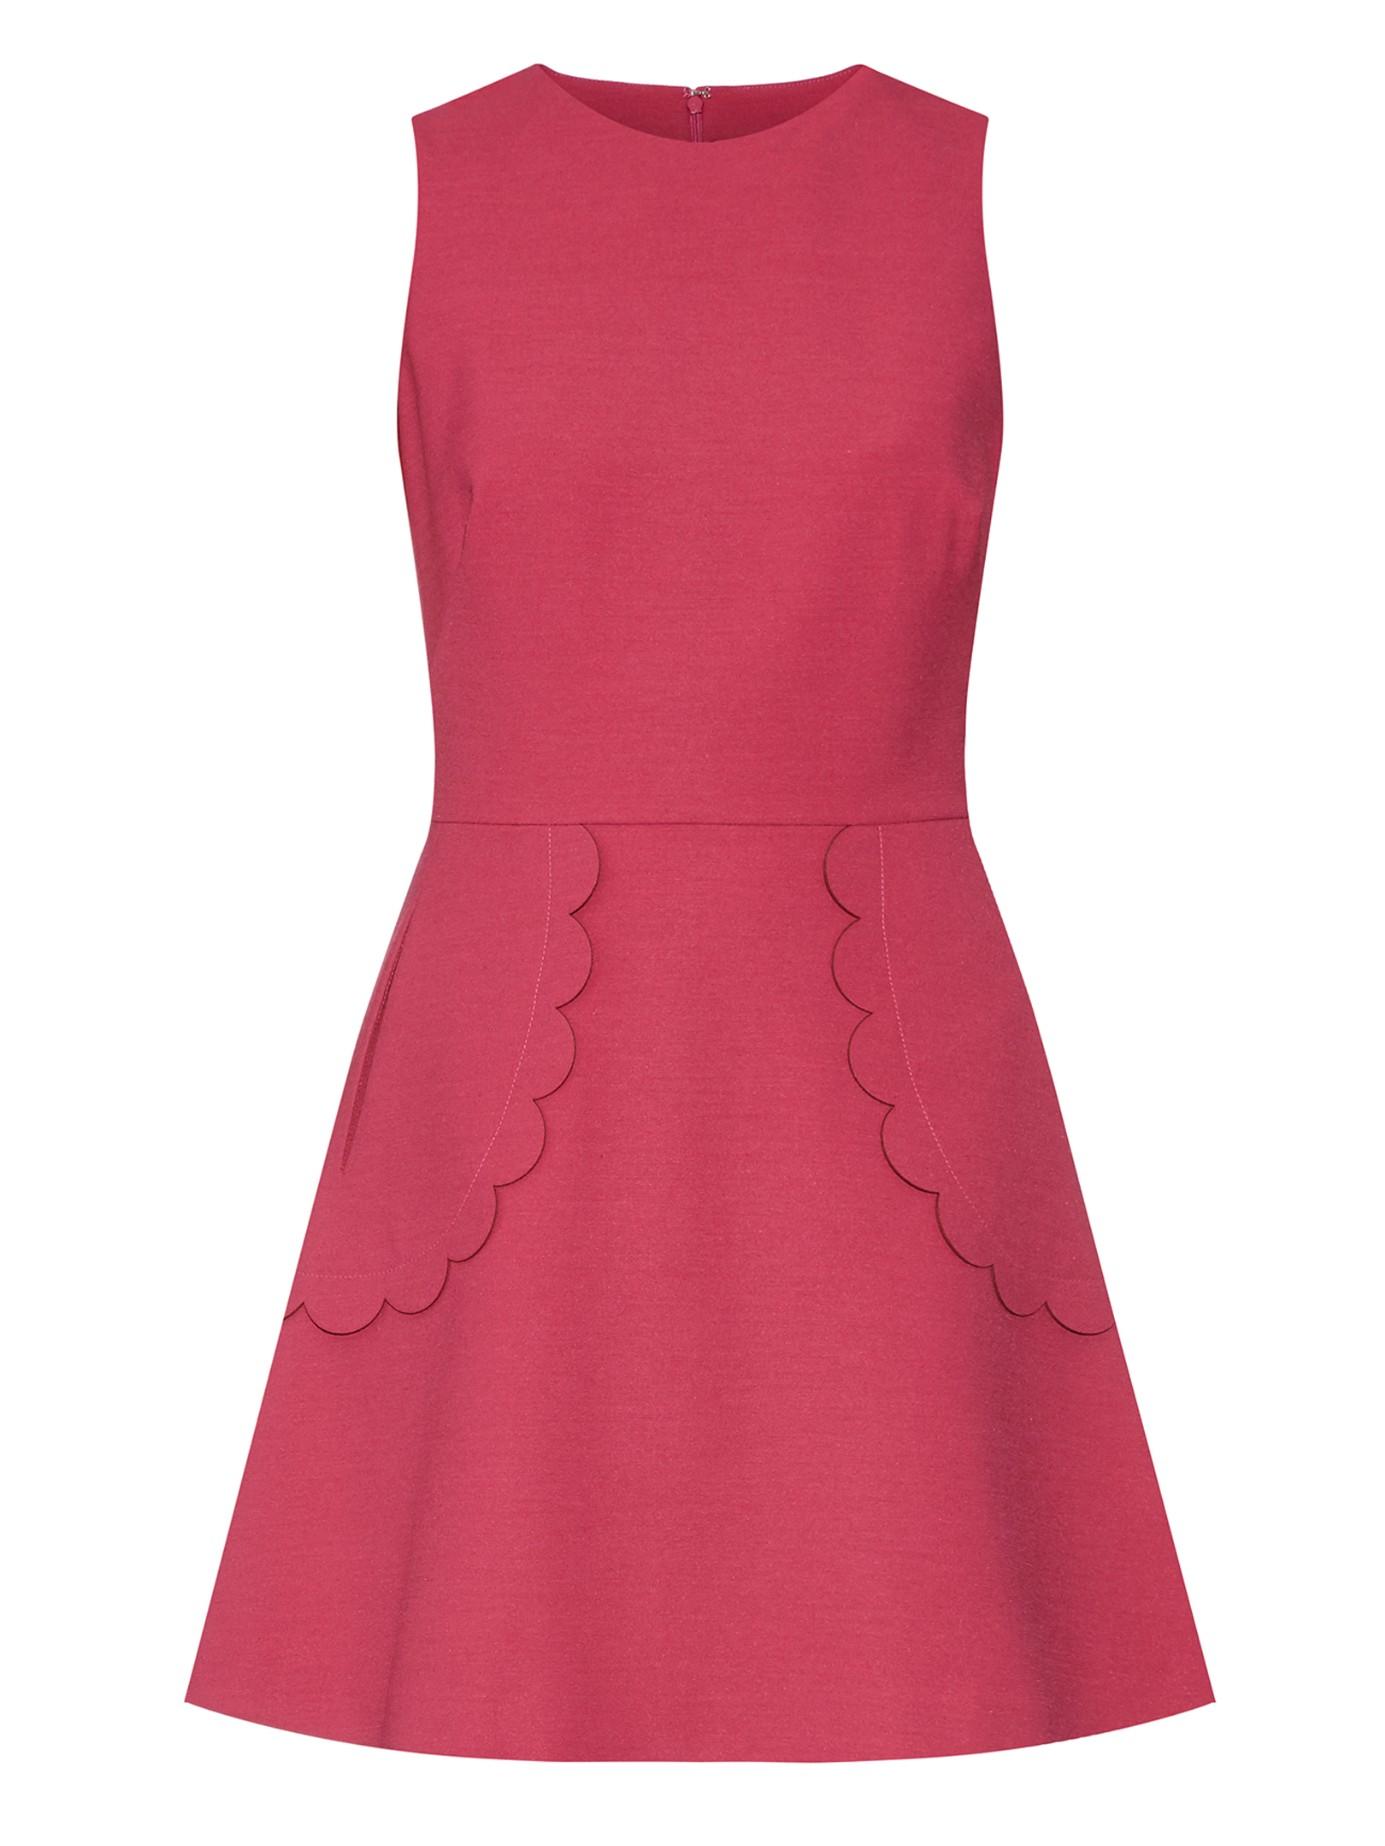 Polka-dot scallop-edged cotton dress Red Valentino vaRuL